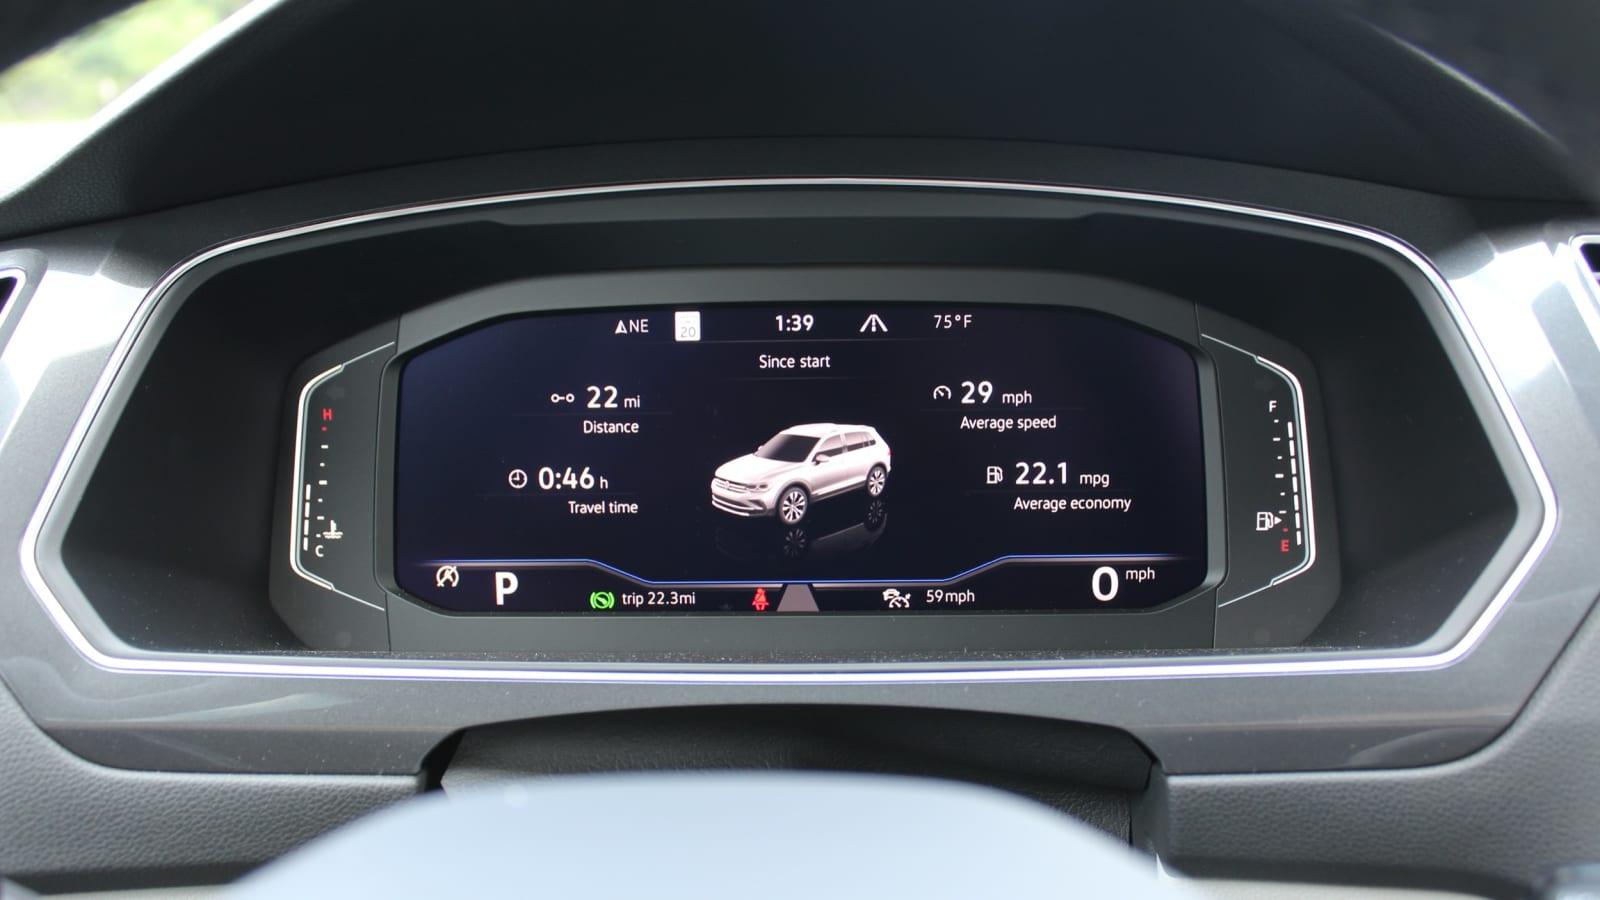 2022 Volkswagen Tiguan Erste Fahrt Bewertung€